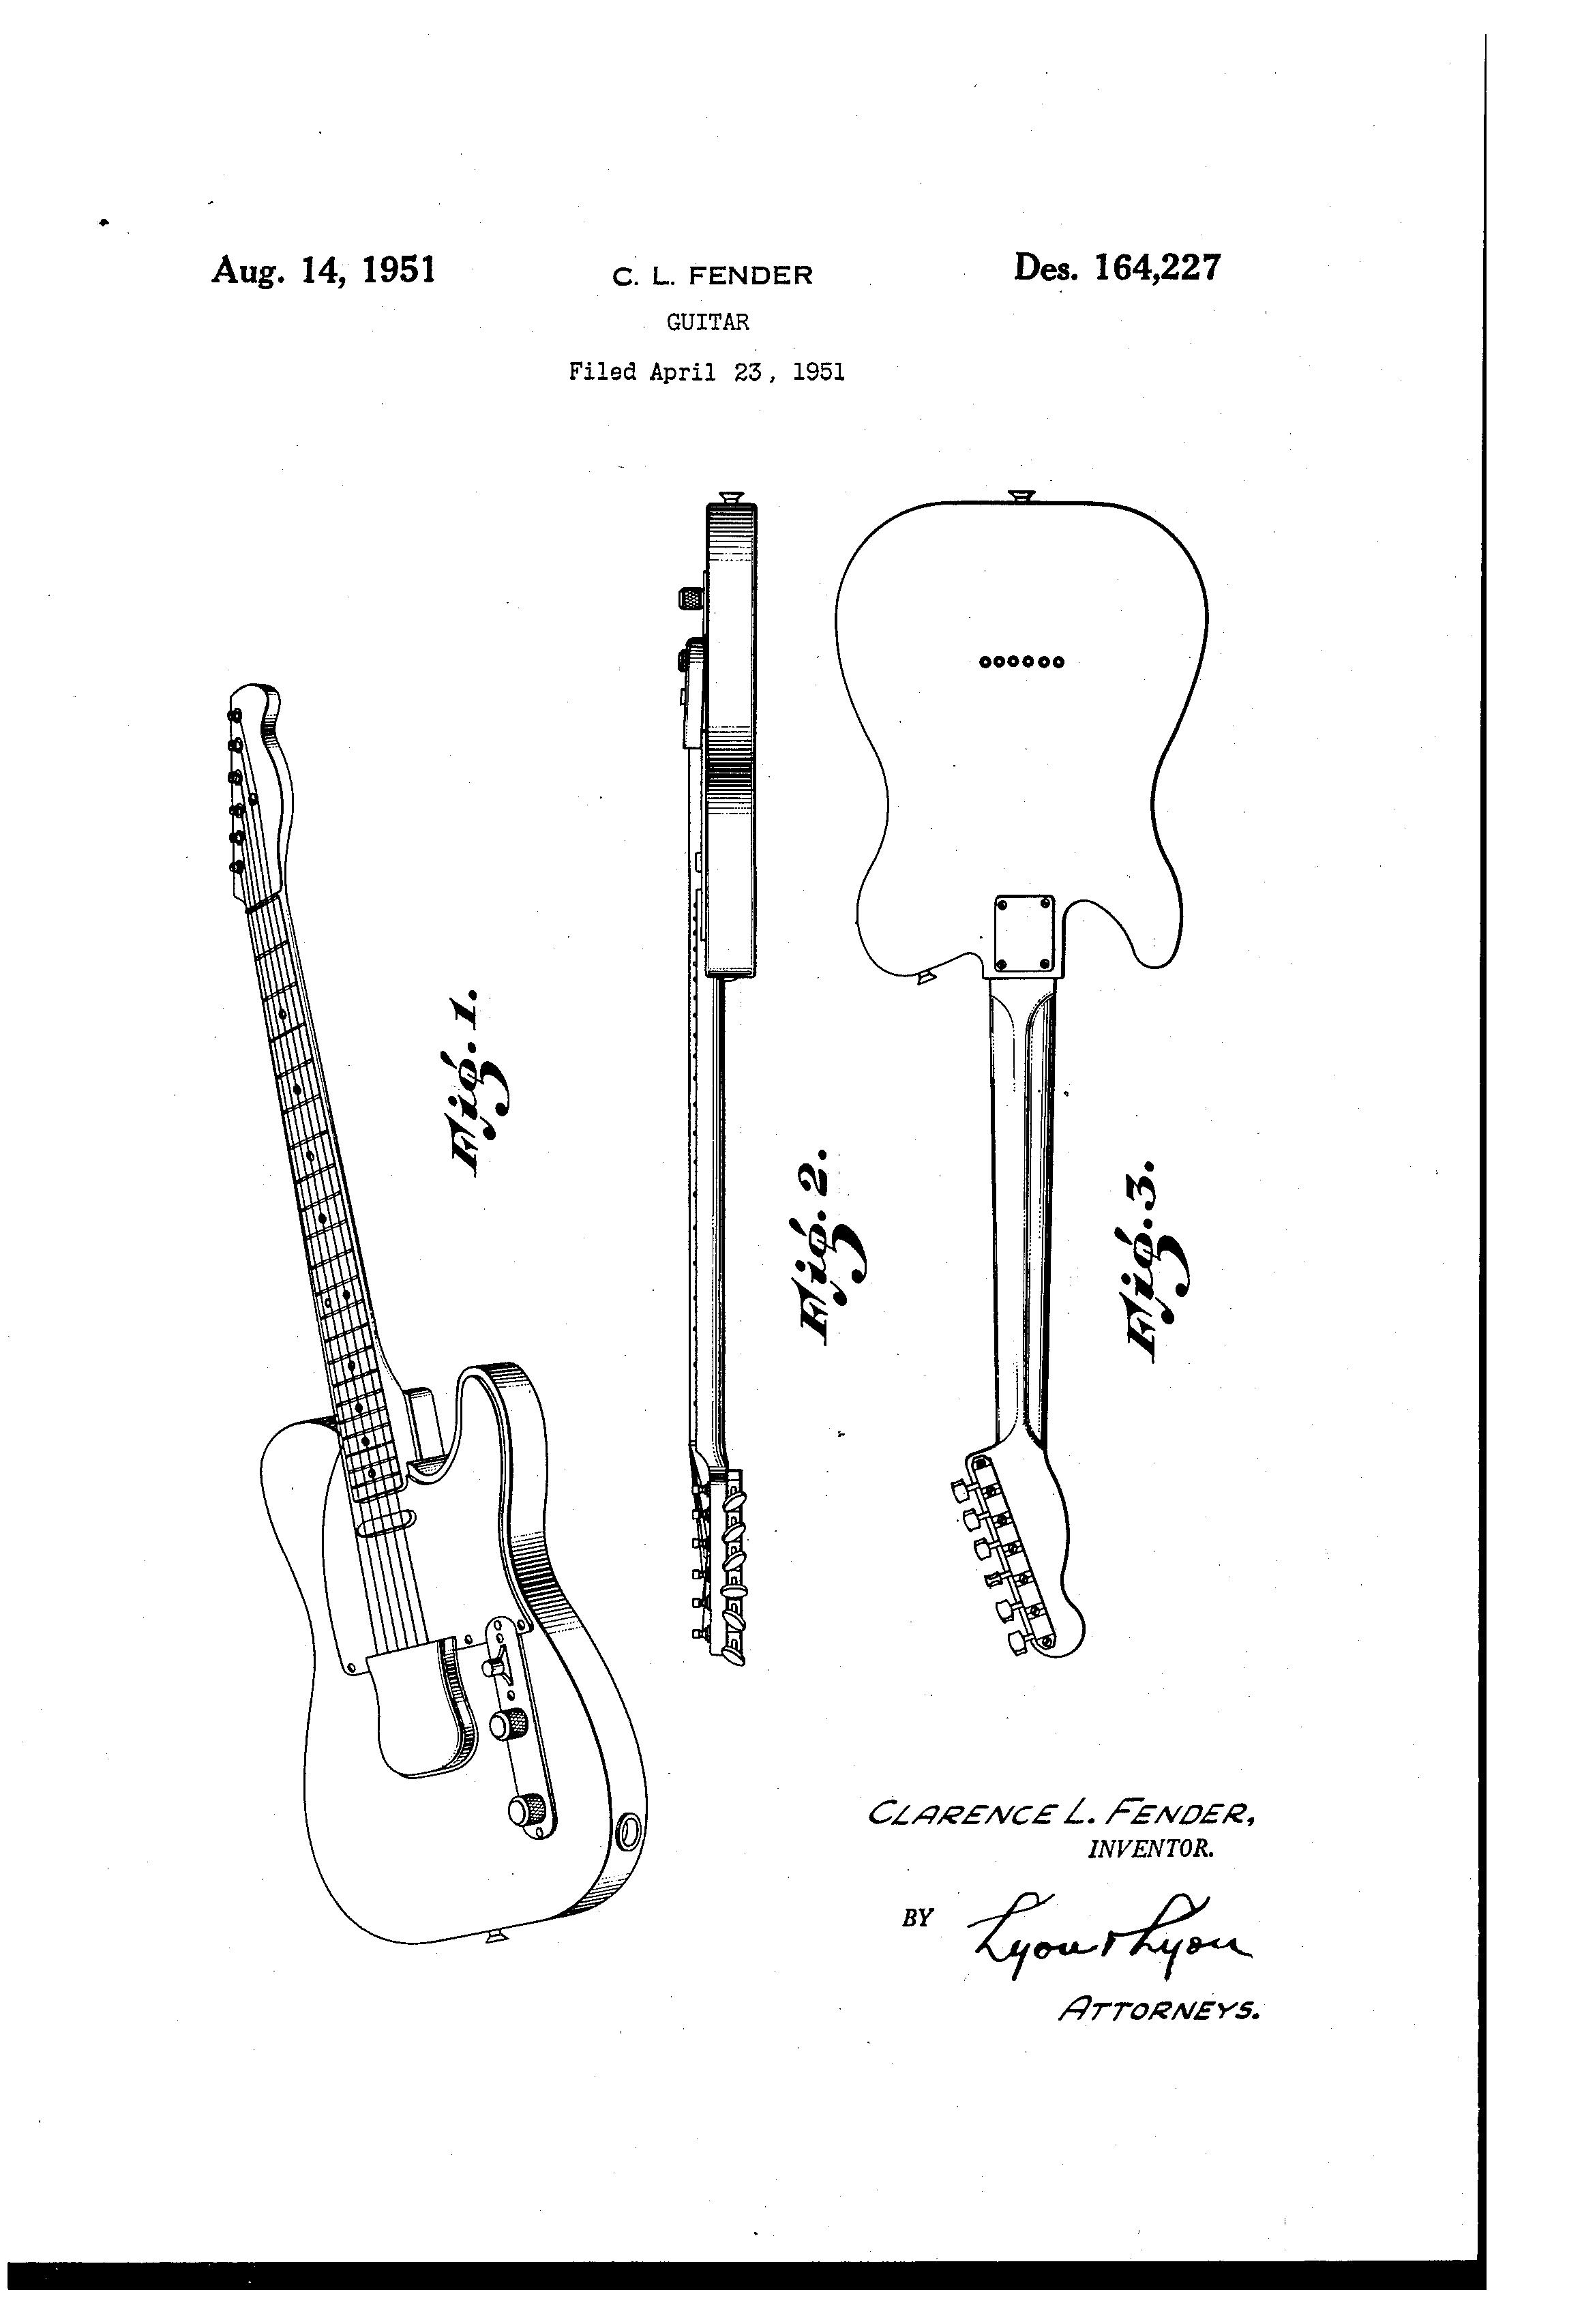 patent usd164227 fender guitar google patents [ 2320 x 3408 Pixel ]